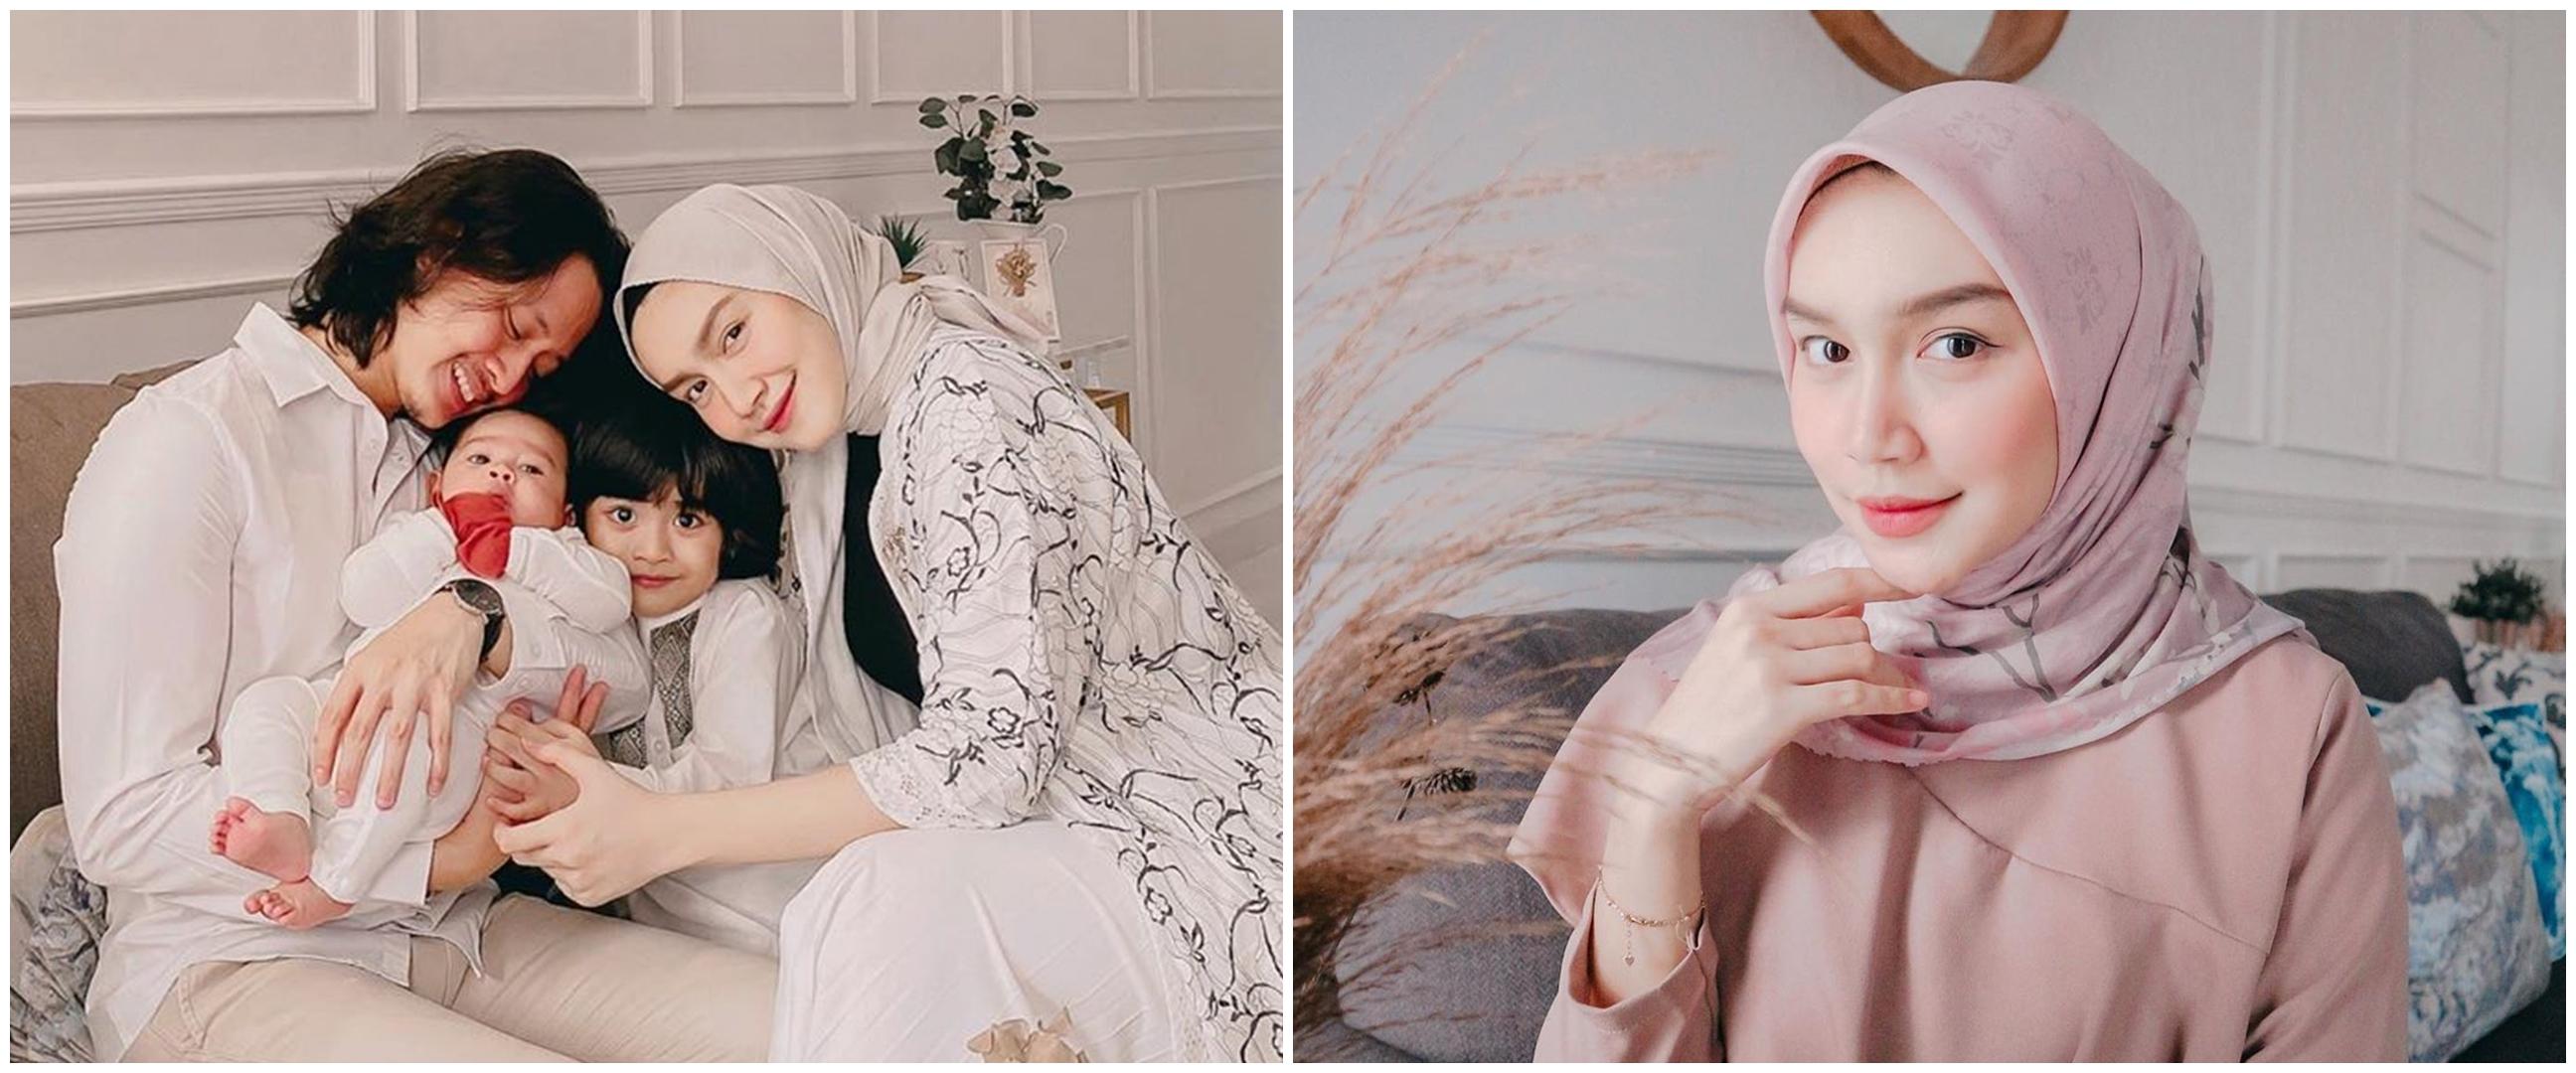 7 Potret rumah Melody Prima bernuansa putih, Instagramable abis